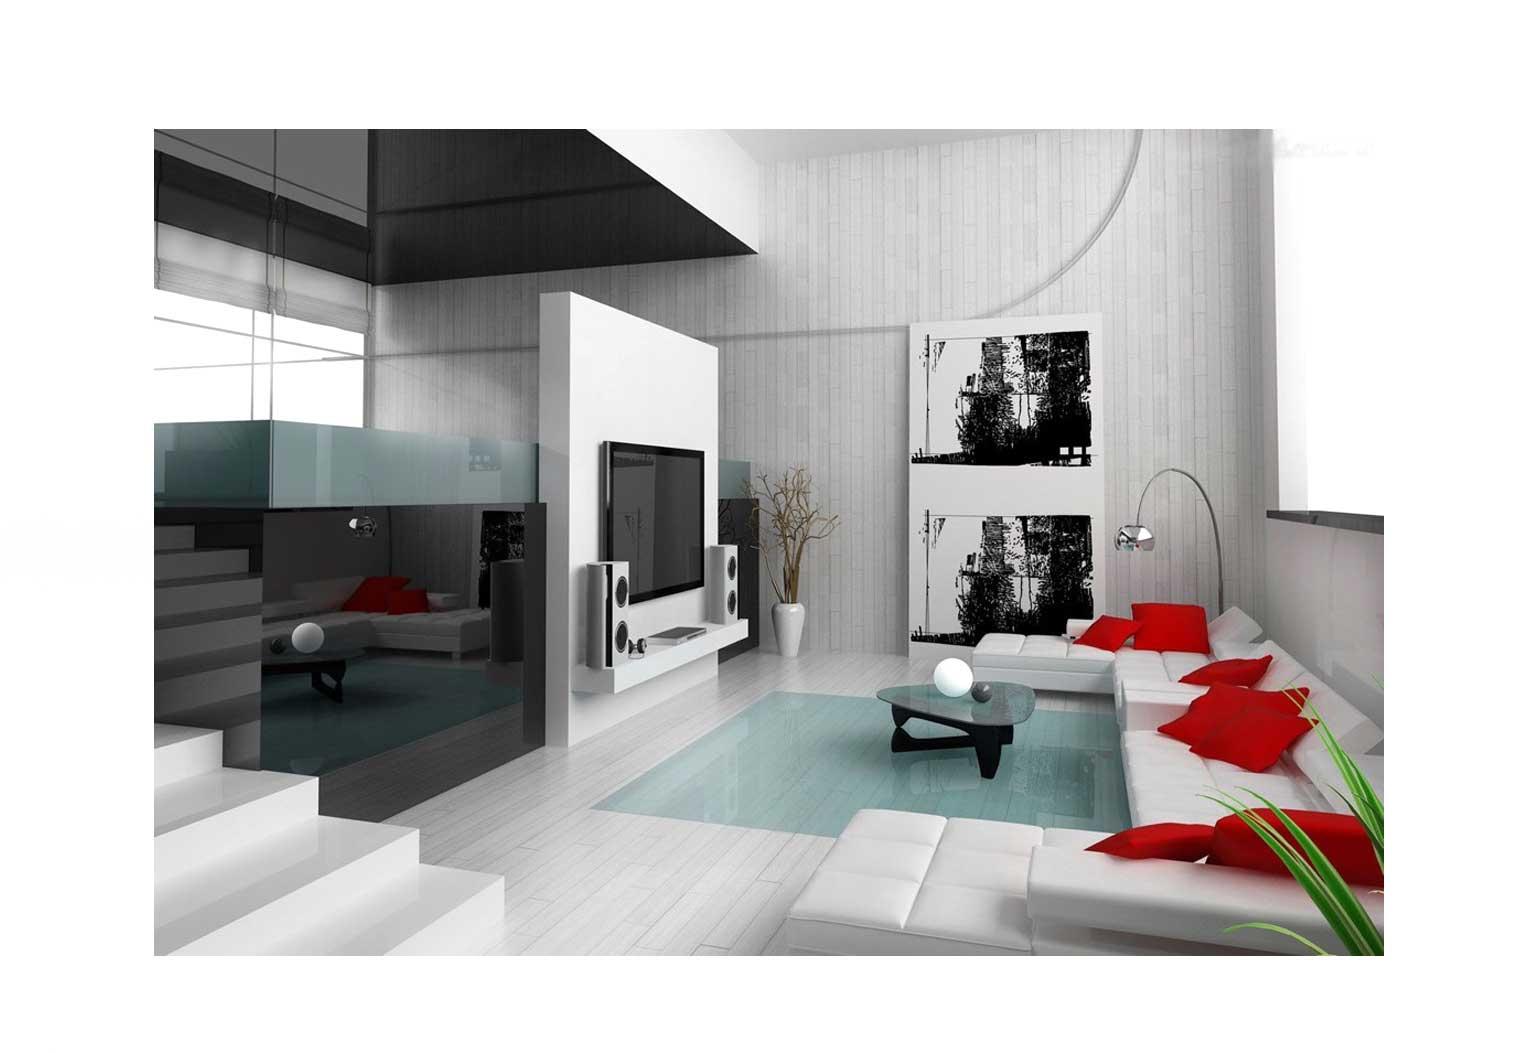 Design An Art centric Room044 - چگونه یک اتاق هنری را طراحی کنیم؟